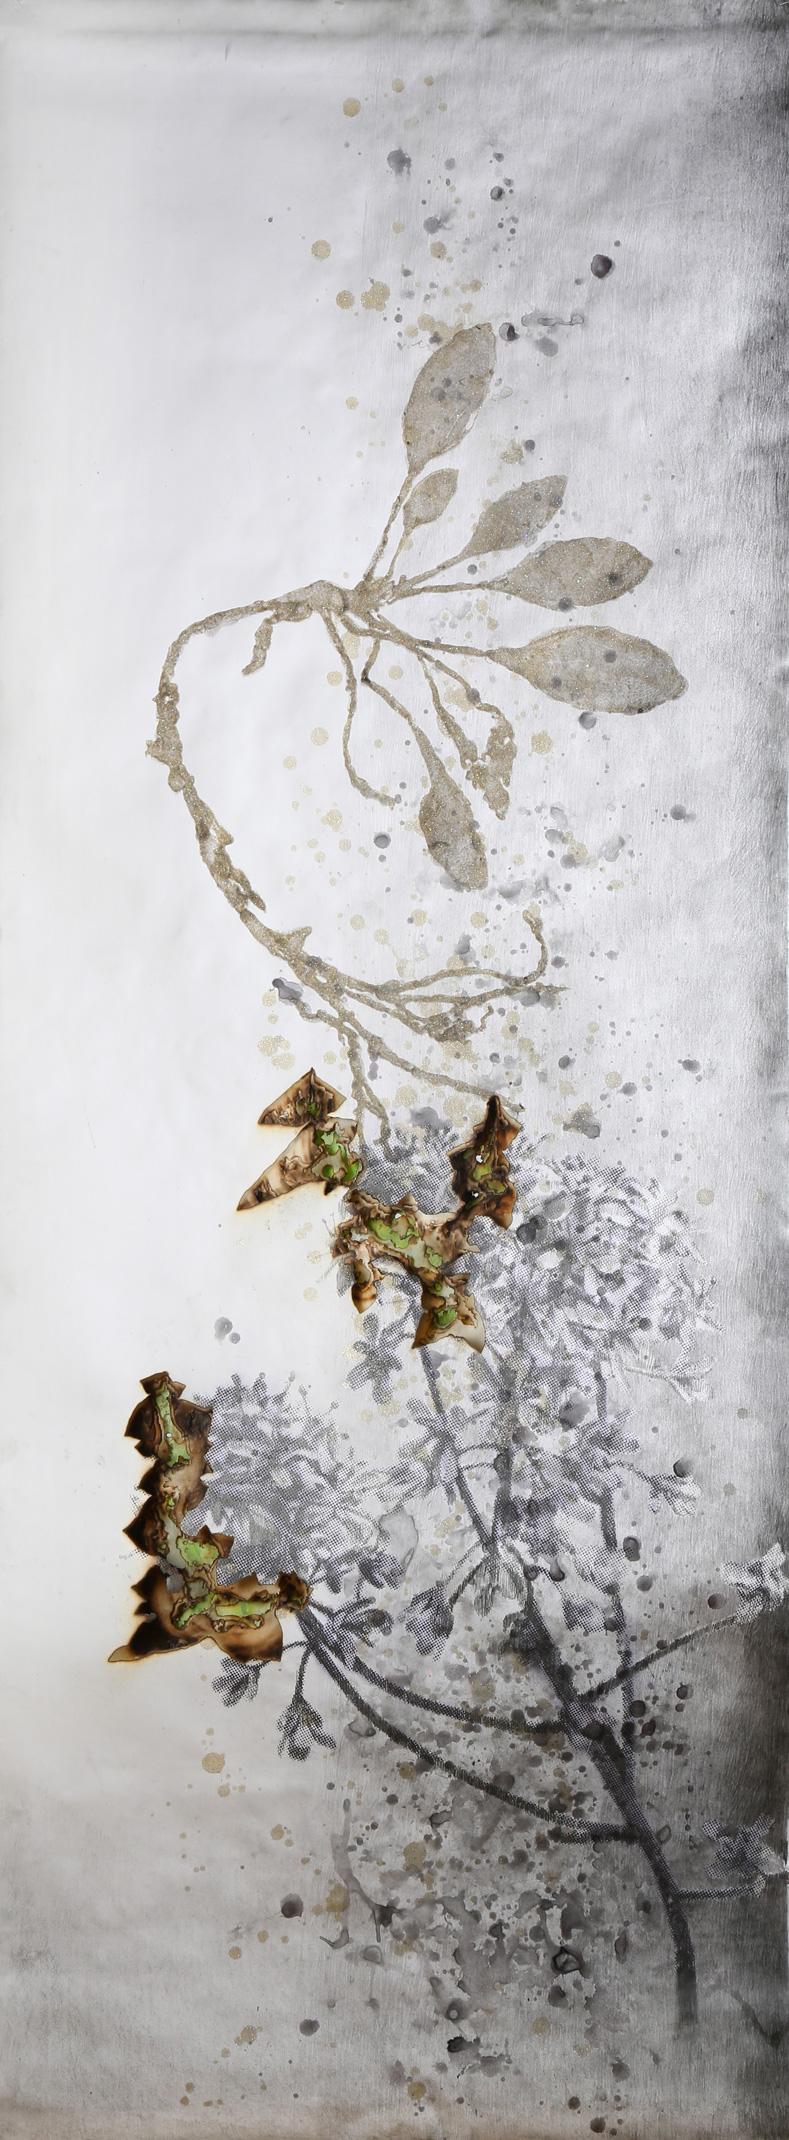 Akira Inumaru - Arc-en-ciel des plantes